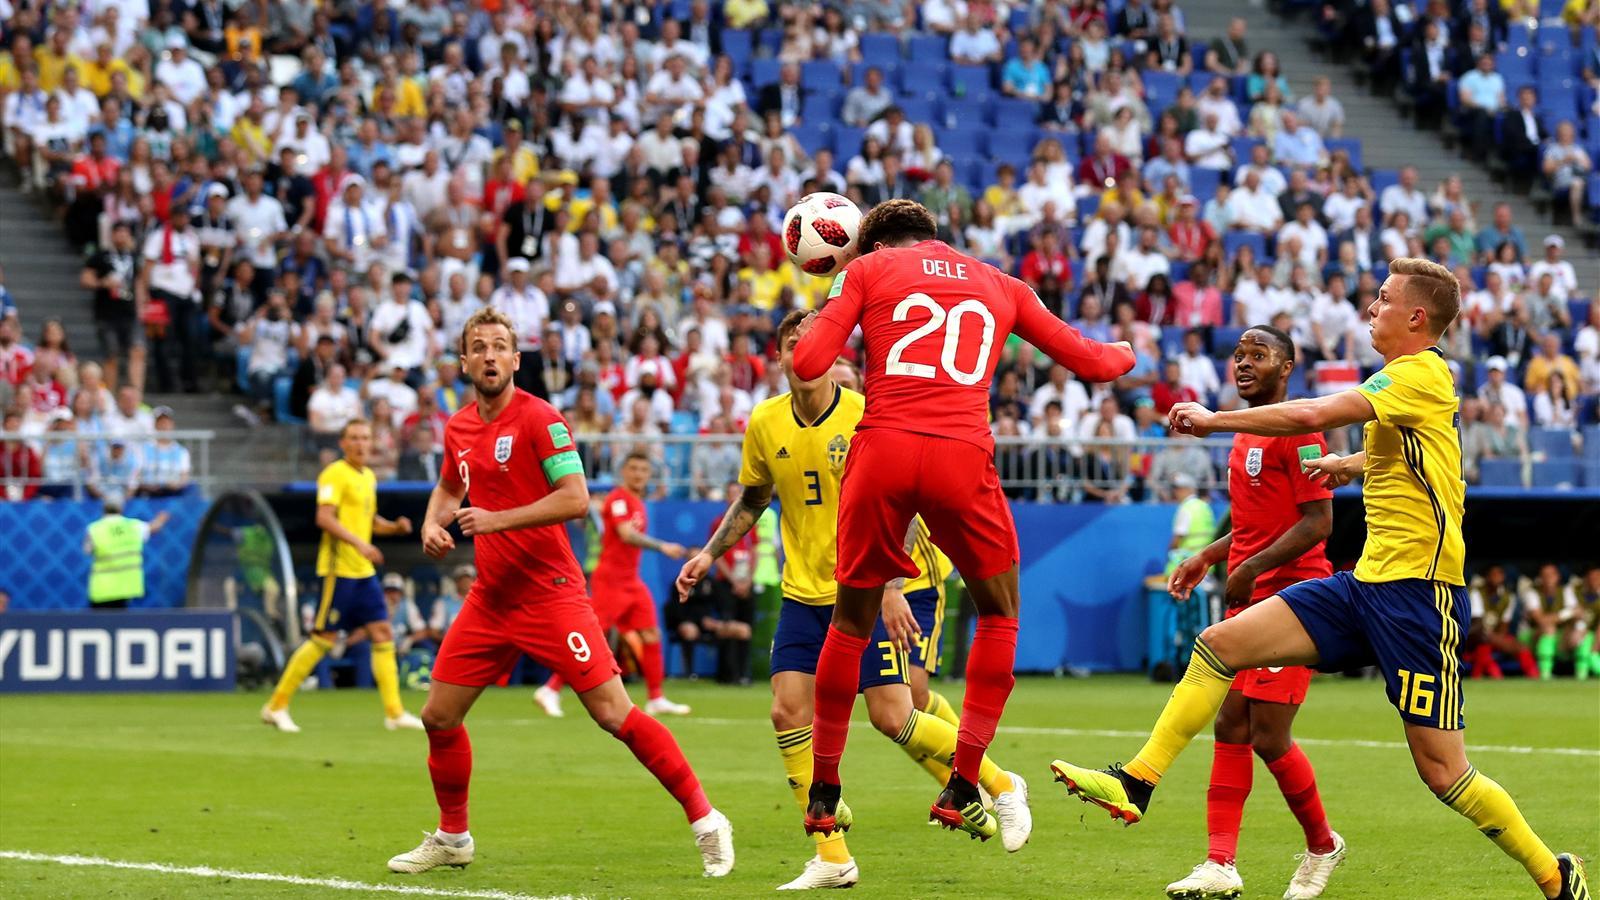 En direct live su de angleterre coupe du monde 7 juillet 2018 eurosport - Resultat coupe angleterre ...